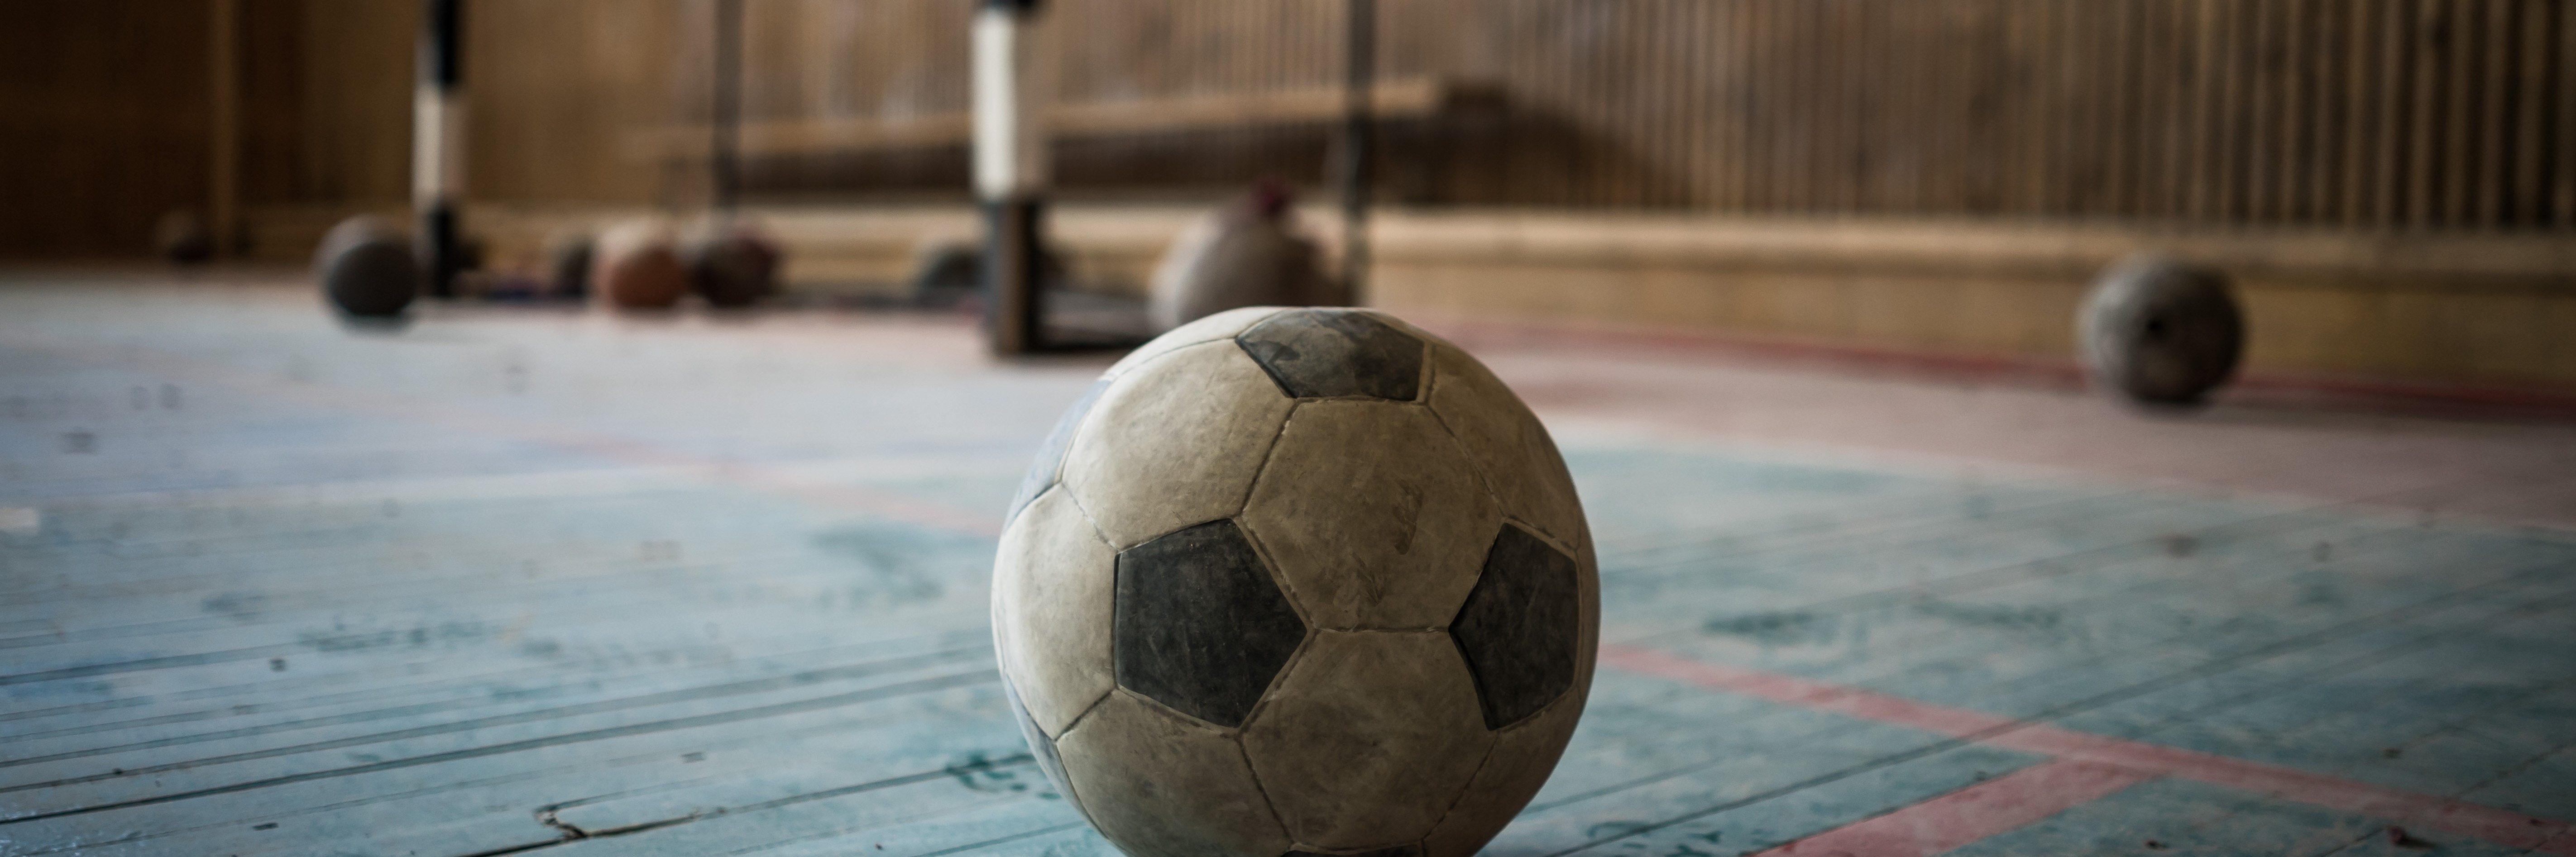 cropped-torriecher_headerimage_handball.jpg